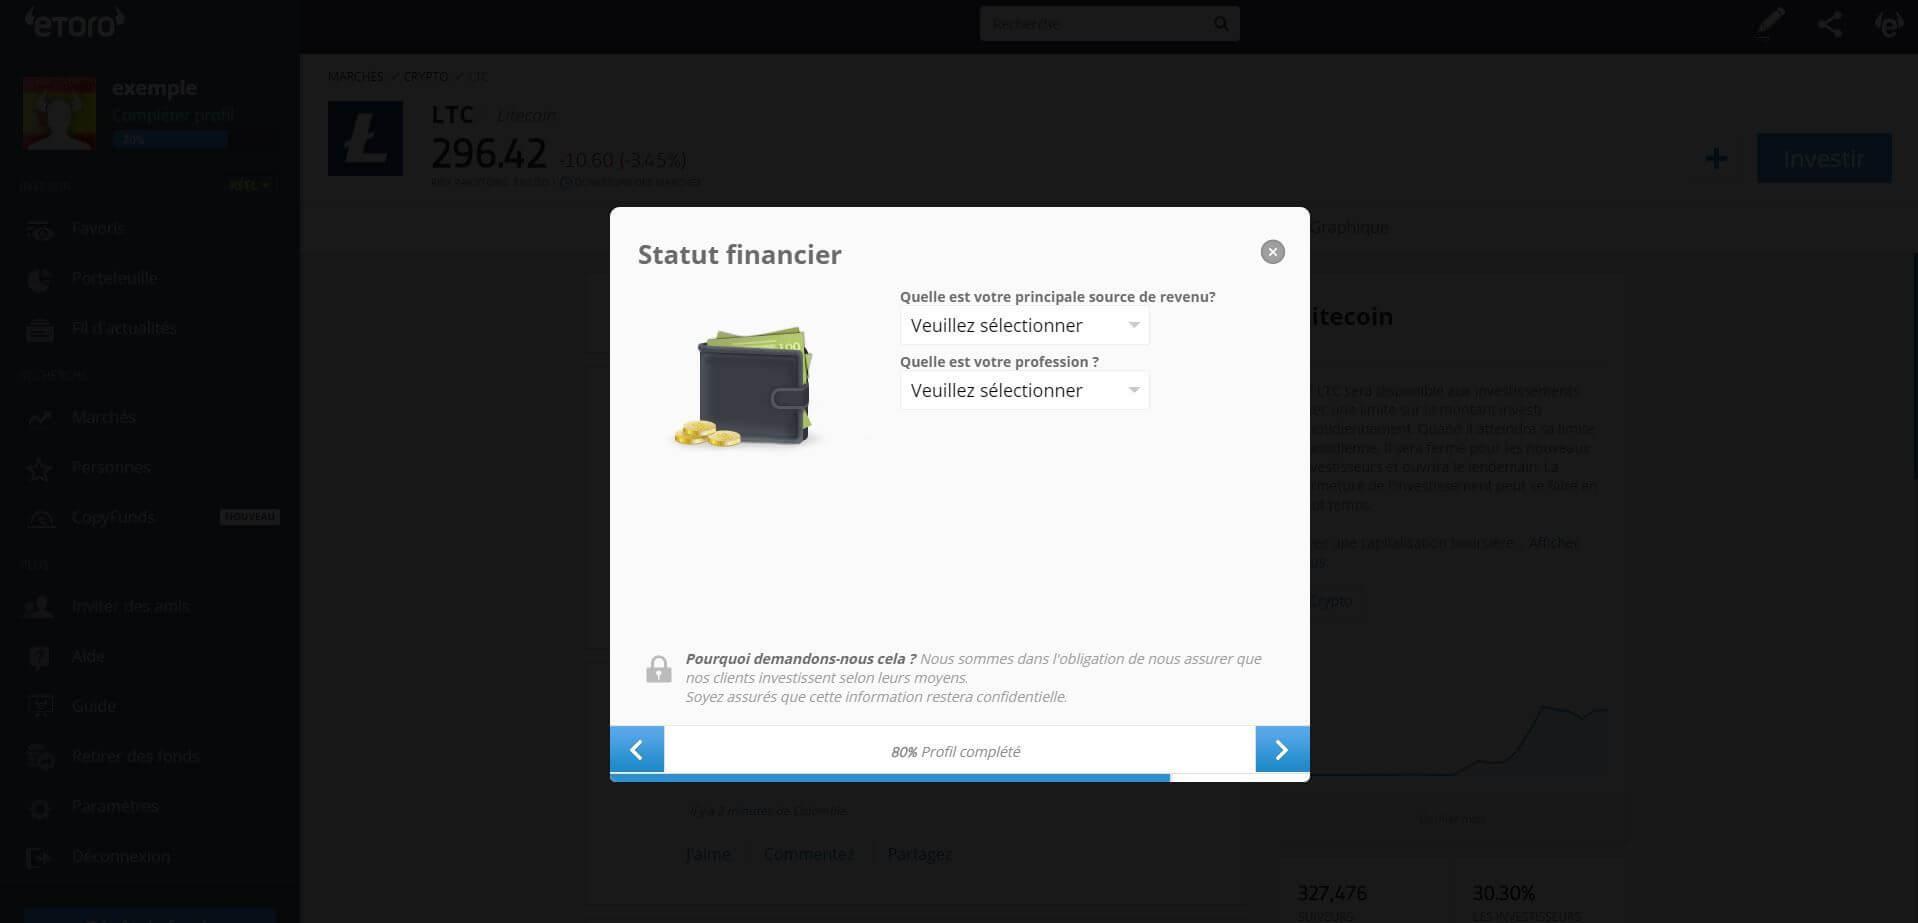 acheter ethereum guide statut